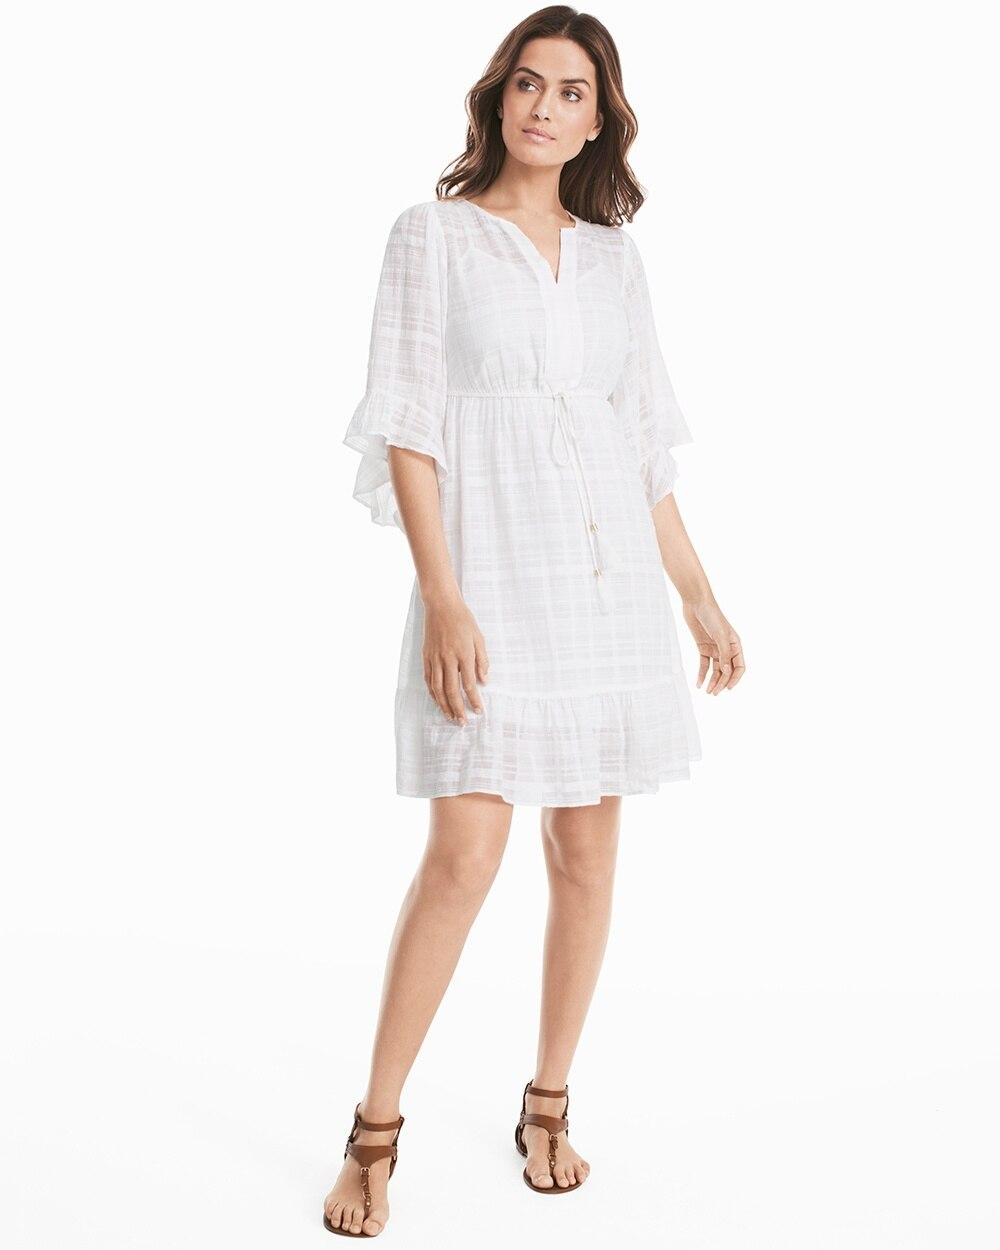 Ruffle Sleeve White Cotton Tie Waist Dress